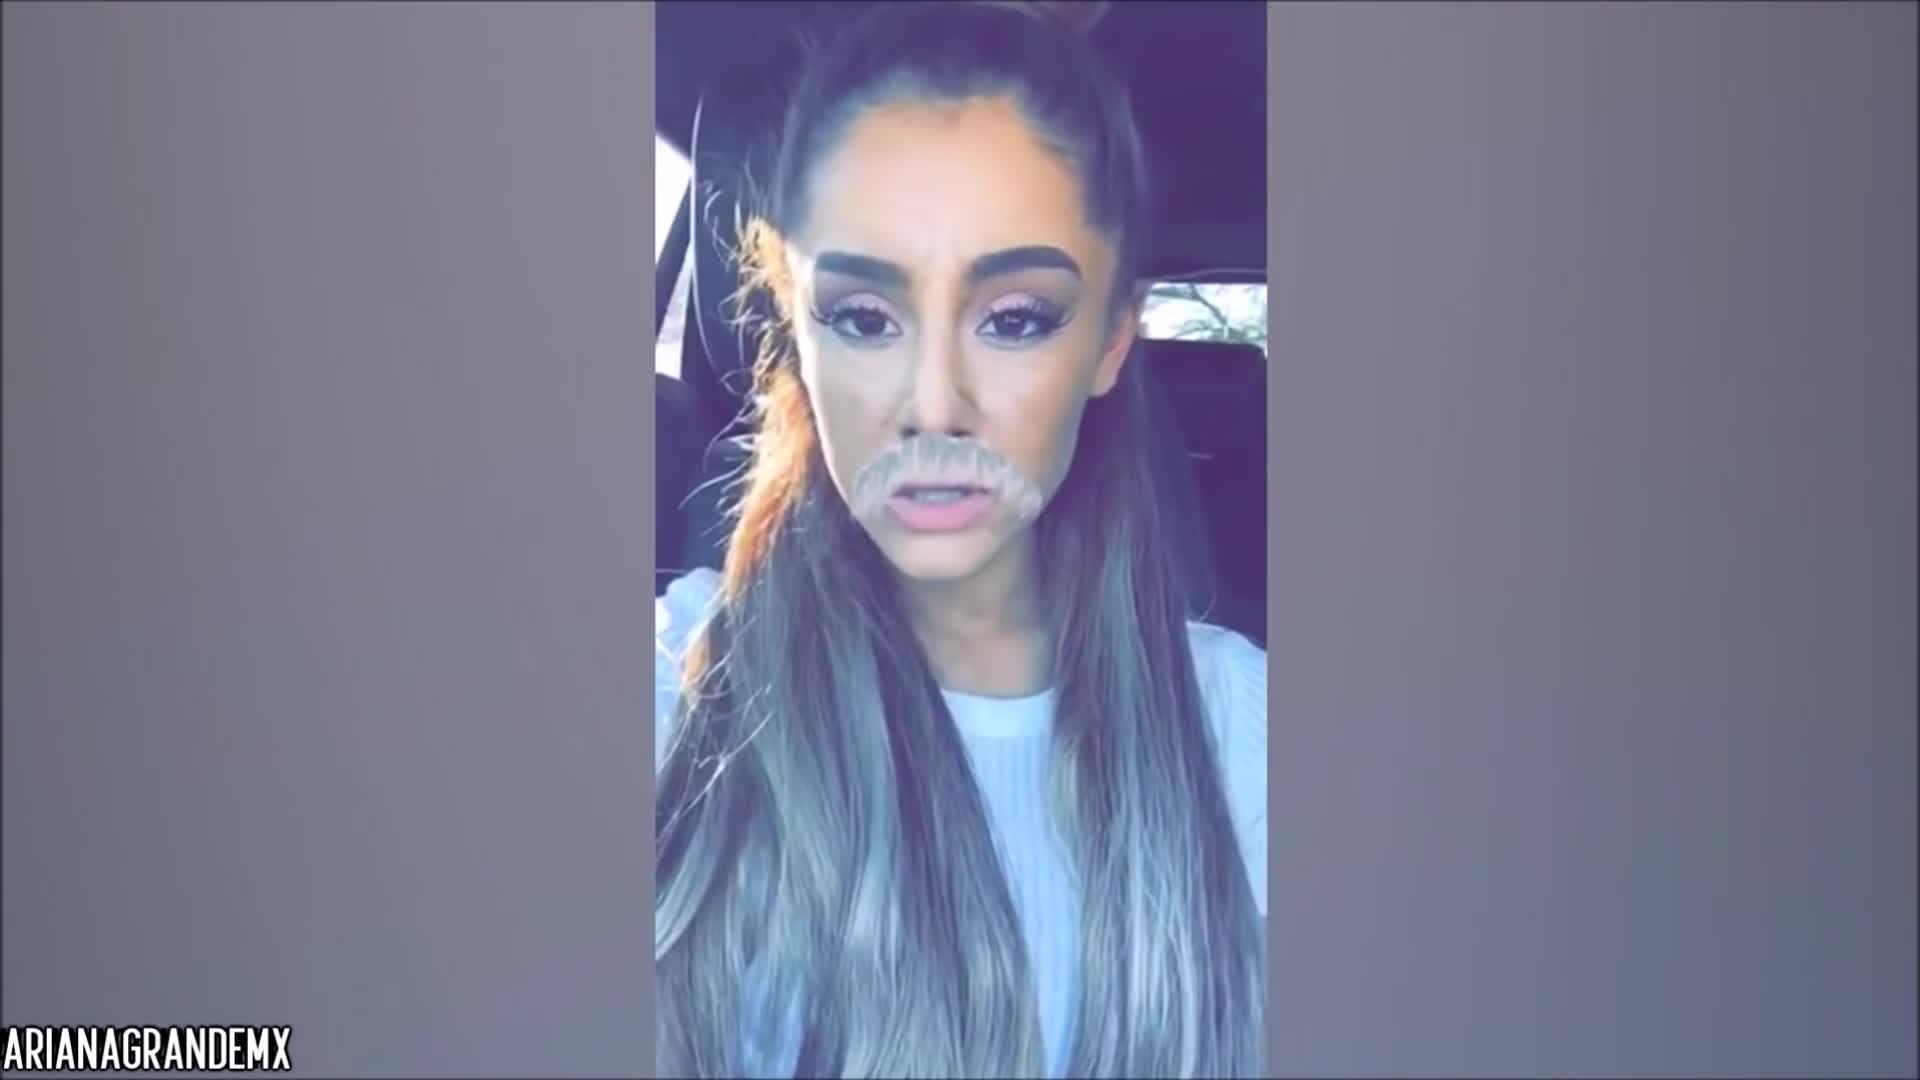 Ariana Grande GIFs